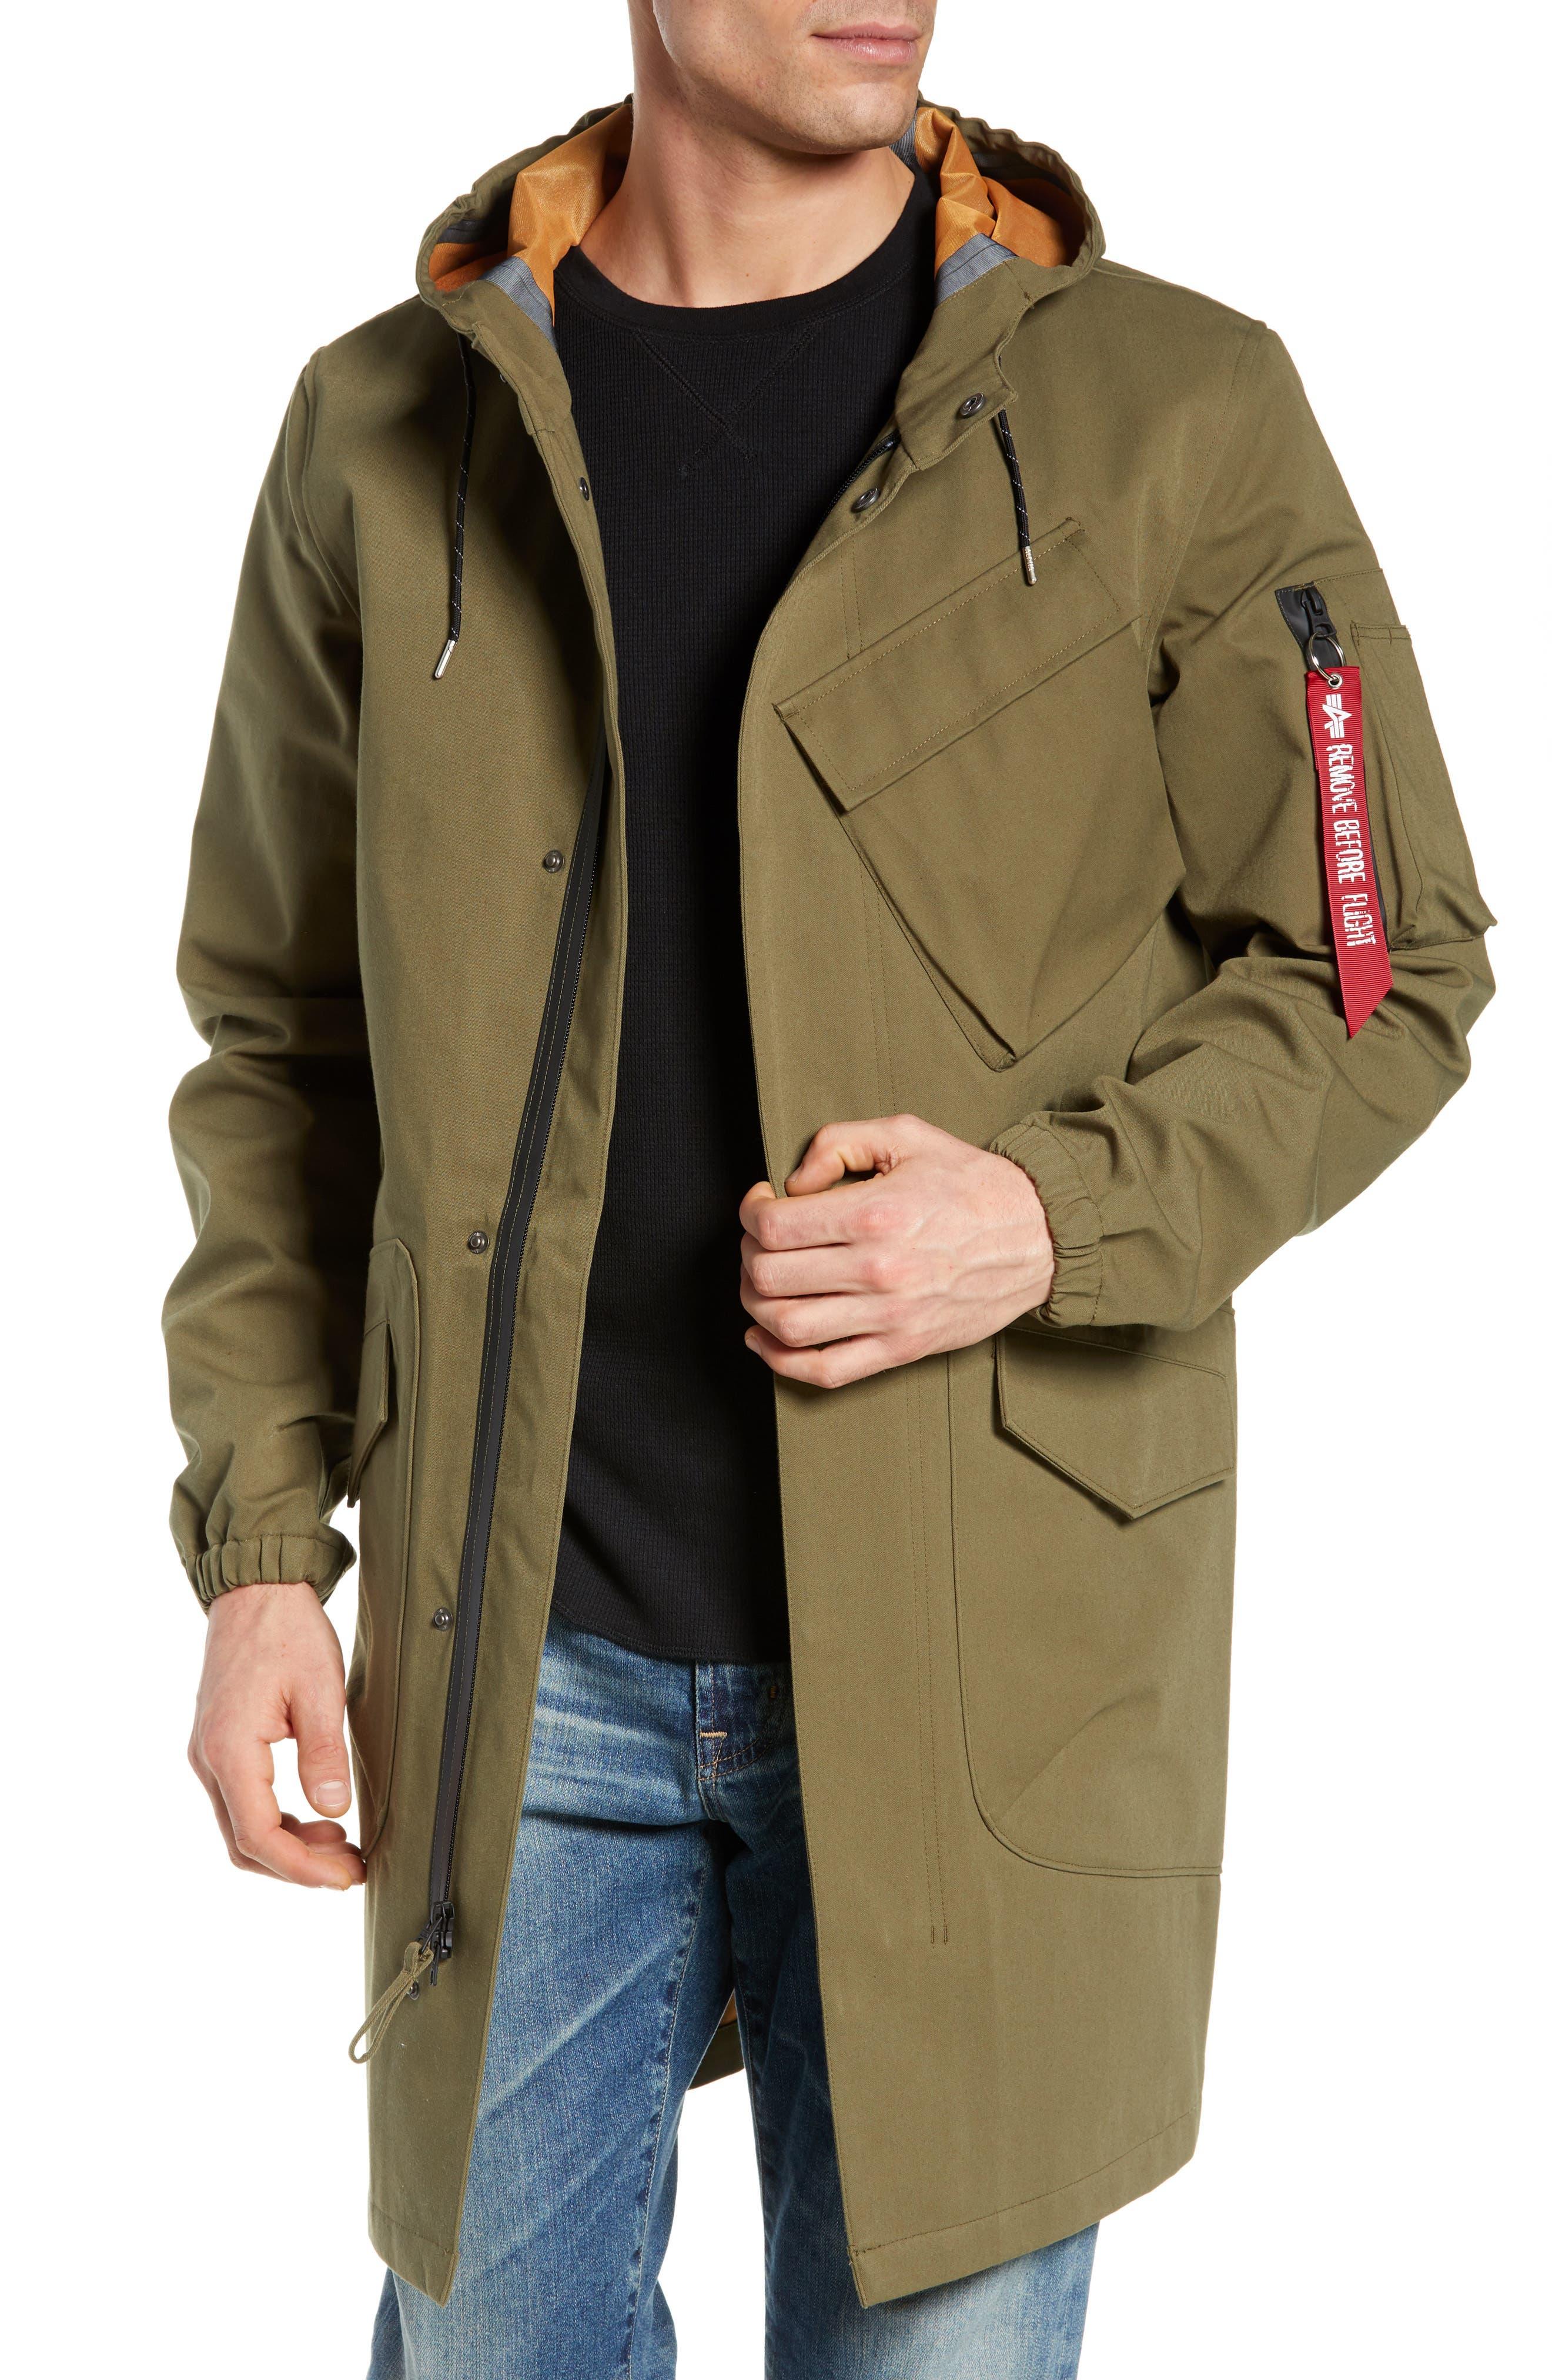 Duster Waterproof Field Coat,                             Main thumbnail 1, color,                             VINTAGE OLIVE